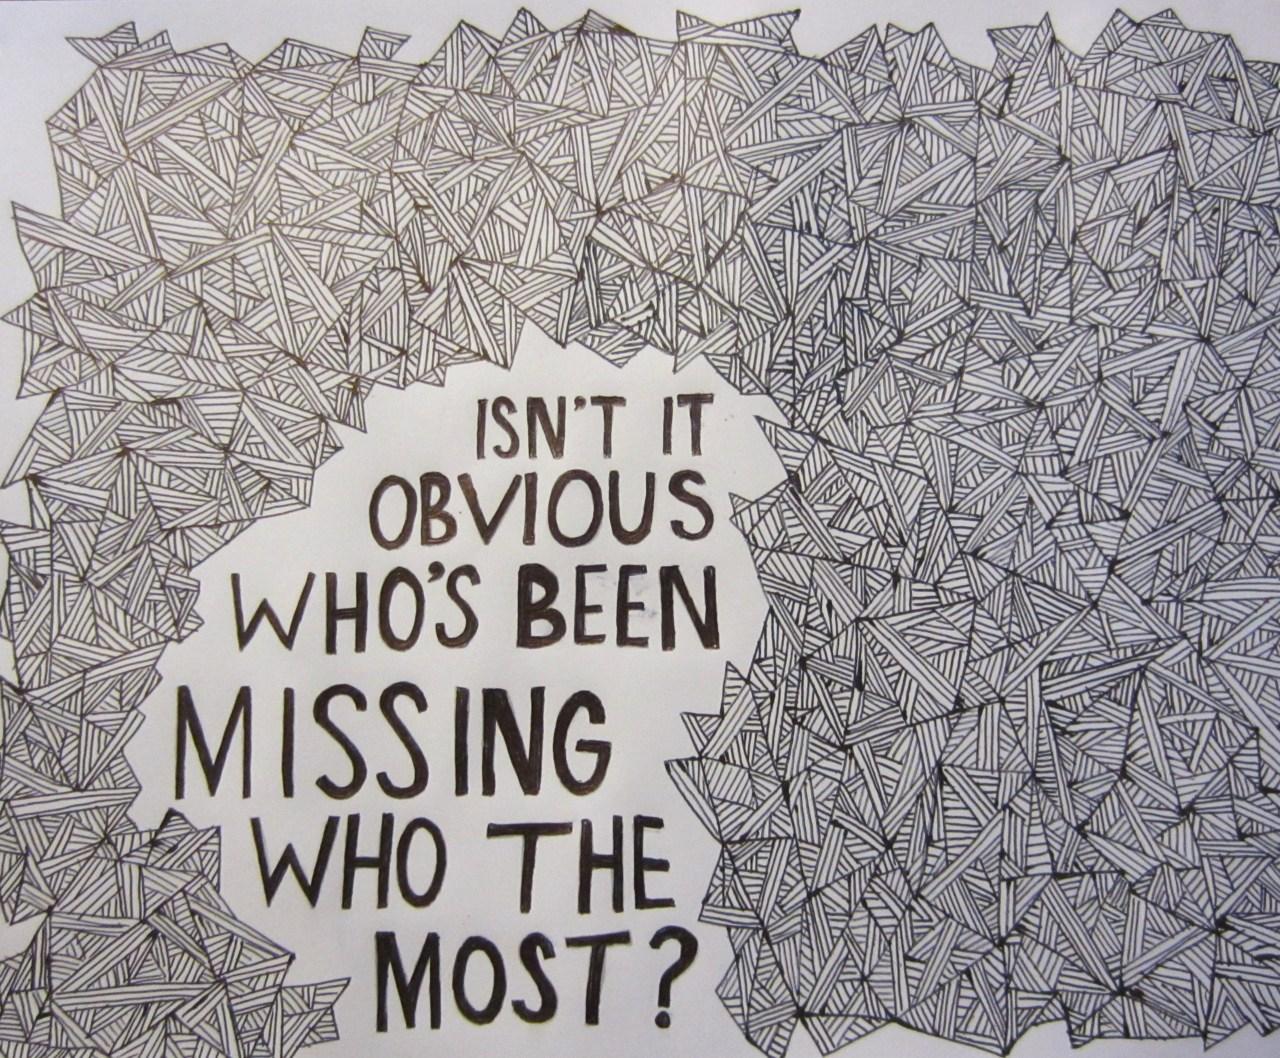 Sad Quotes About Lost Friendship Quotesgram: Lost Best Friend Quotes. QuotesGram